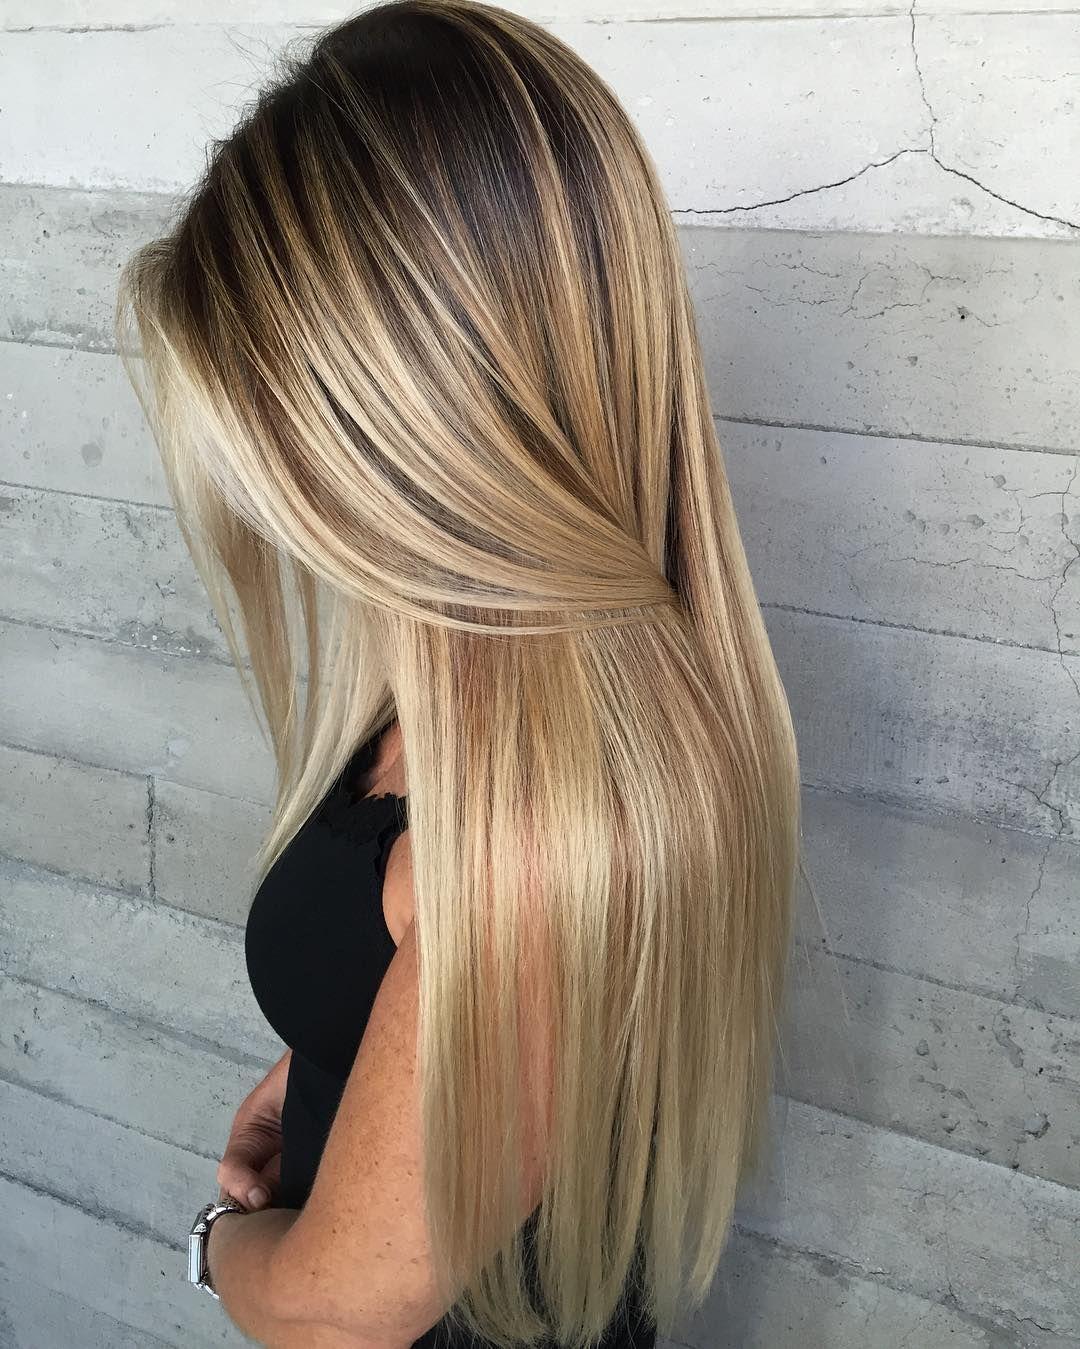 Regardez Cette Photo Instagram De Alexisbutterflyloft 1 917 Mentions J Aime Hair Styles Hair Color Balayage Long Hair Styles